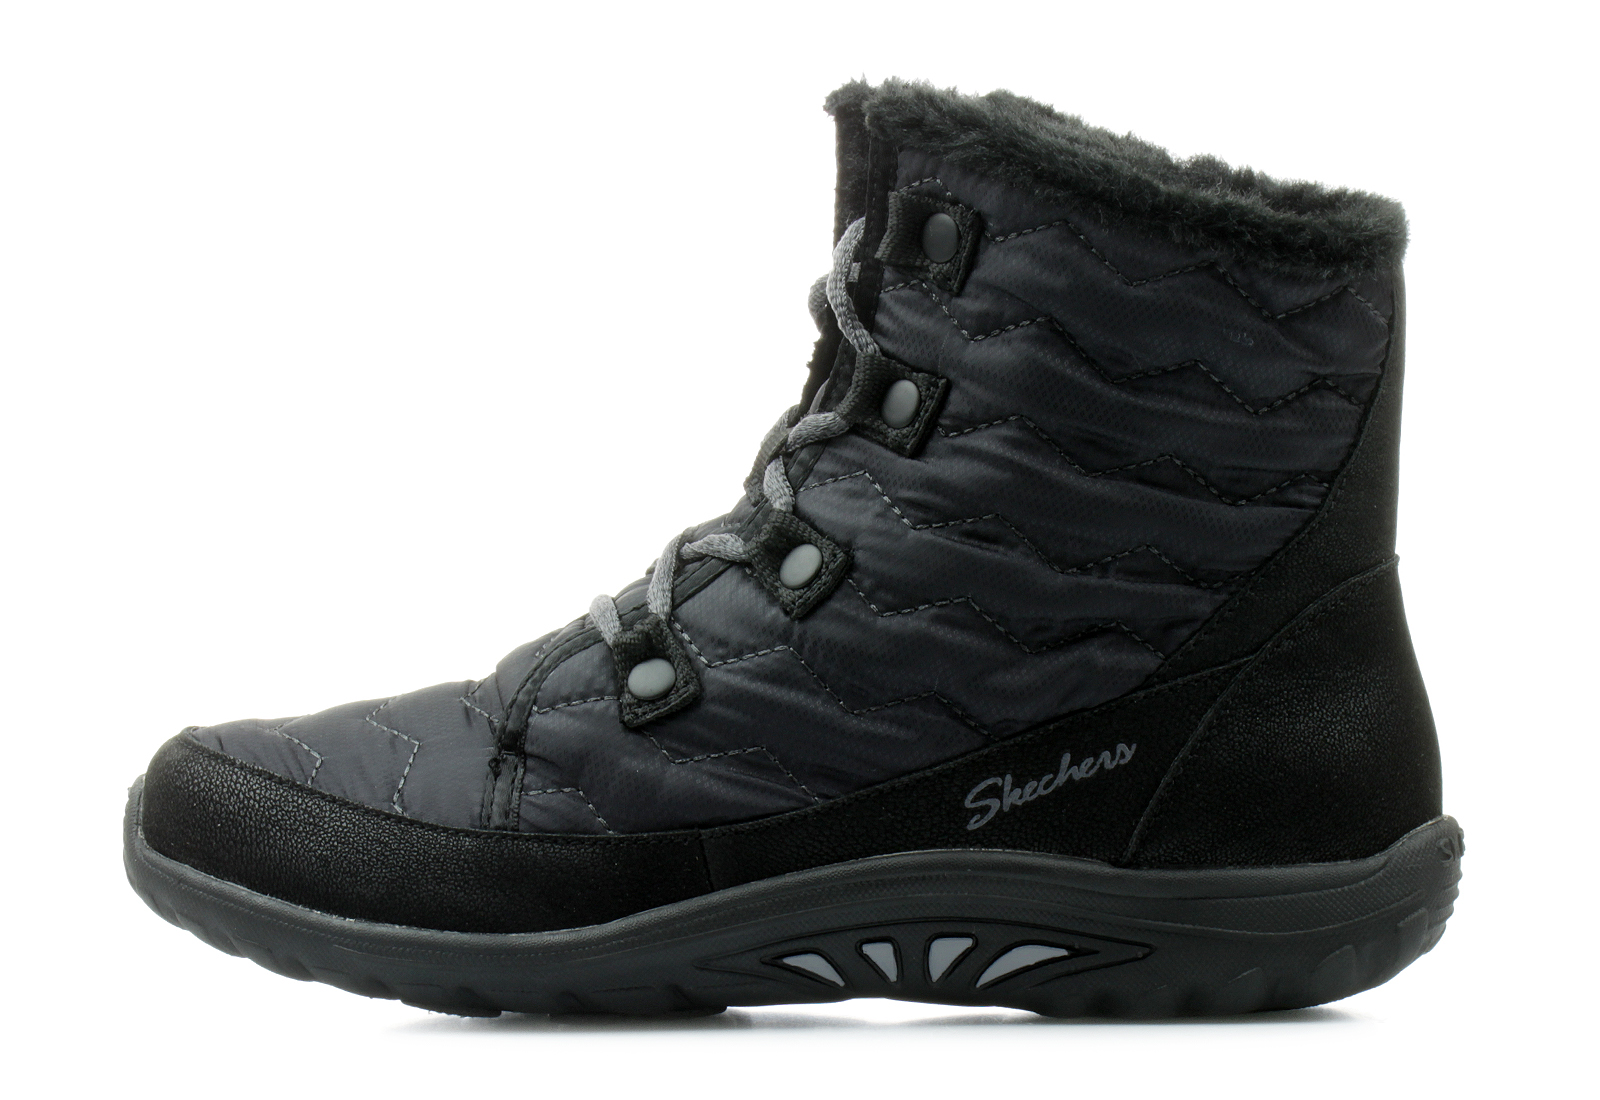 Skechers Boots Reggae Fest Vector 49434 Blk Online